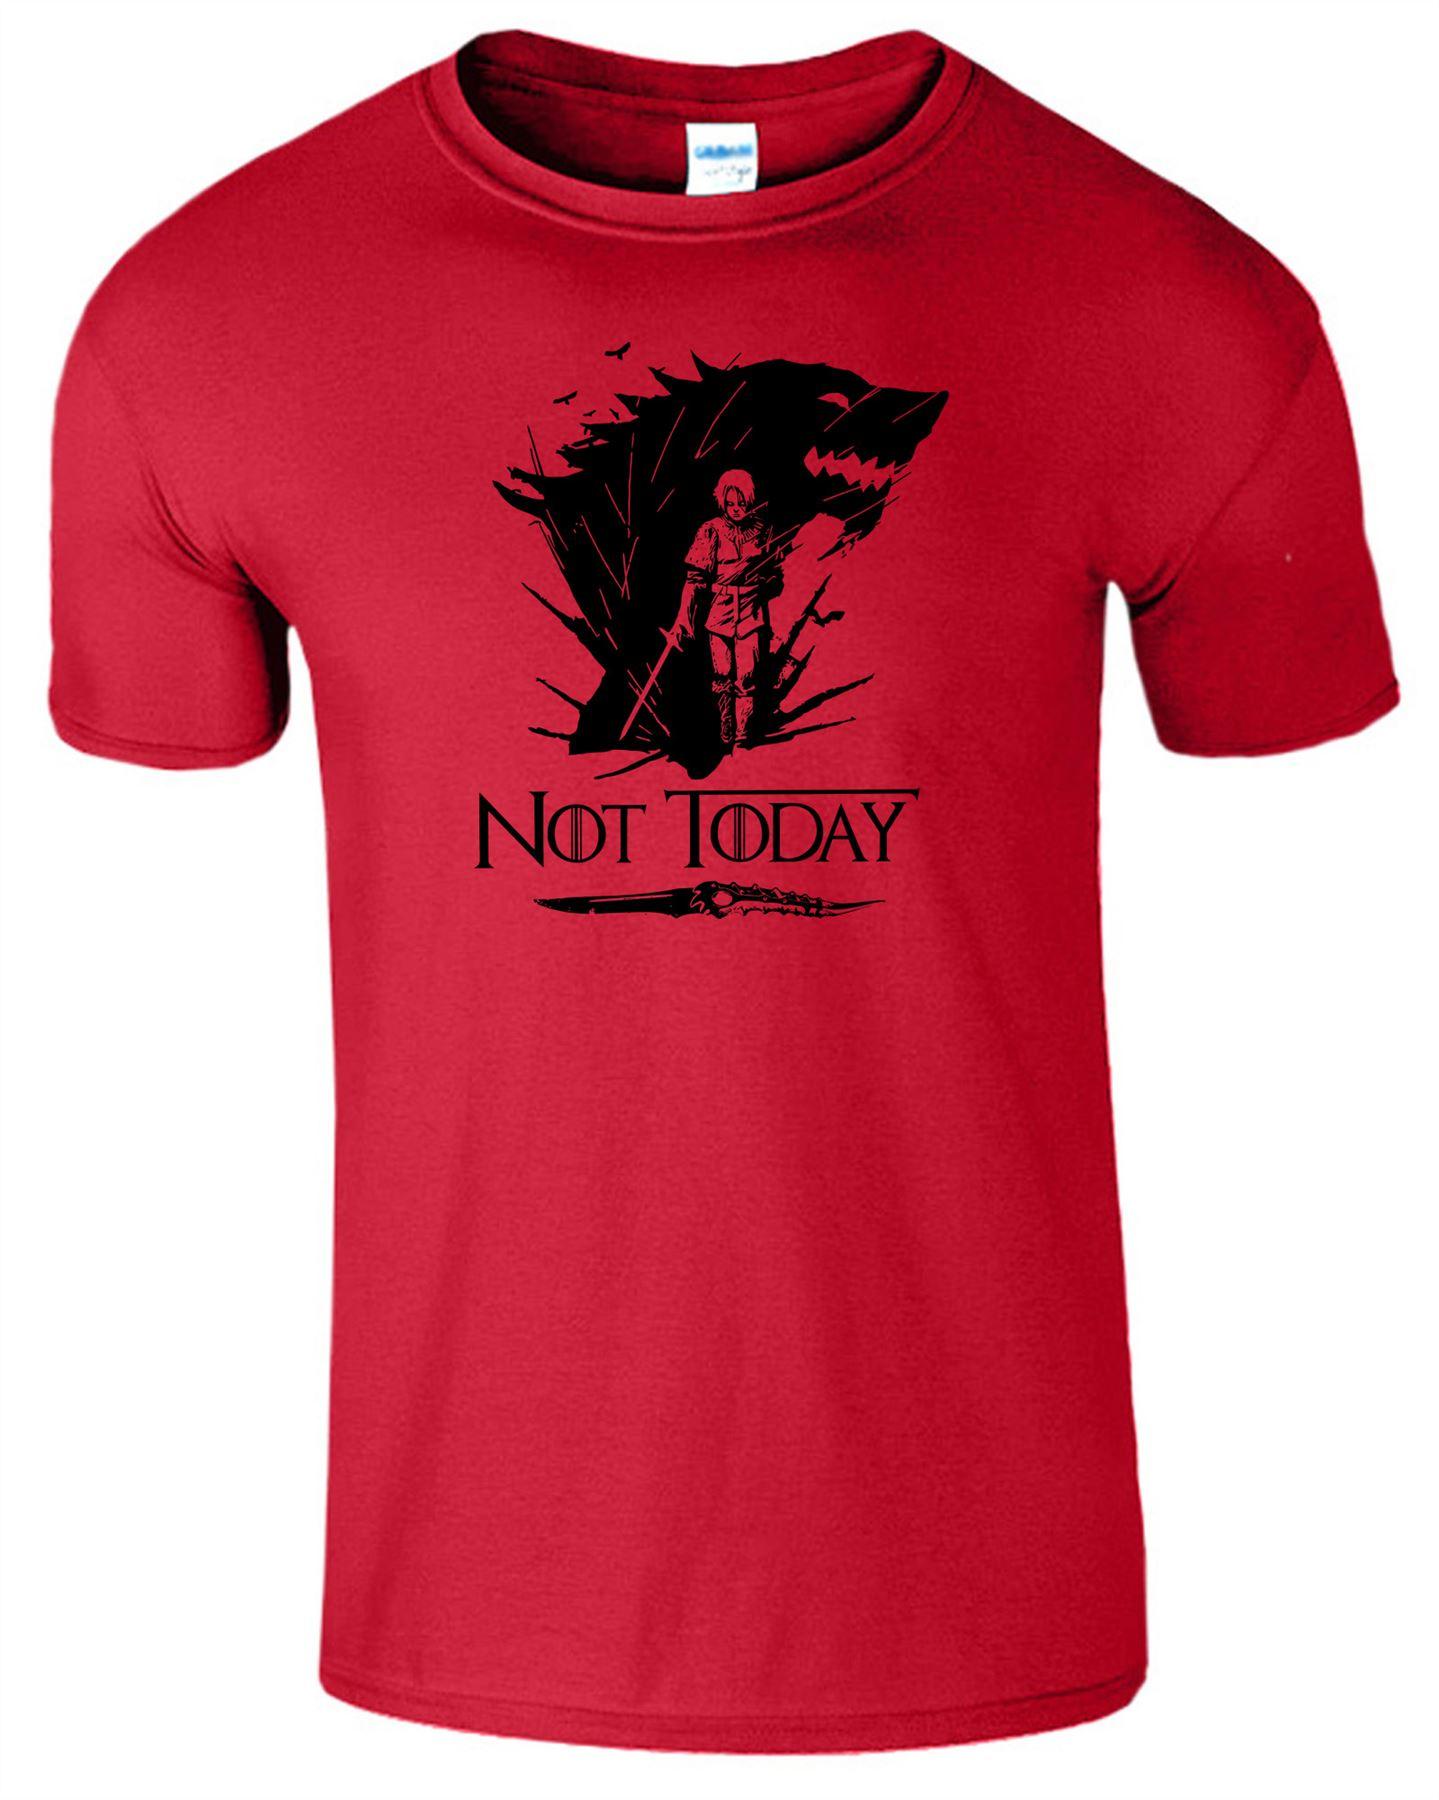 Arya-Stark-Not-Today-T-Shirt-Mens-Game-Season-Womens-Shirt-Adults-Unisex-Fit Indexbild 5